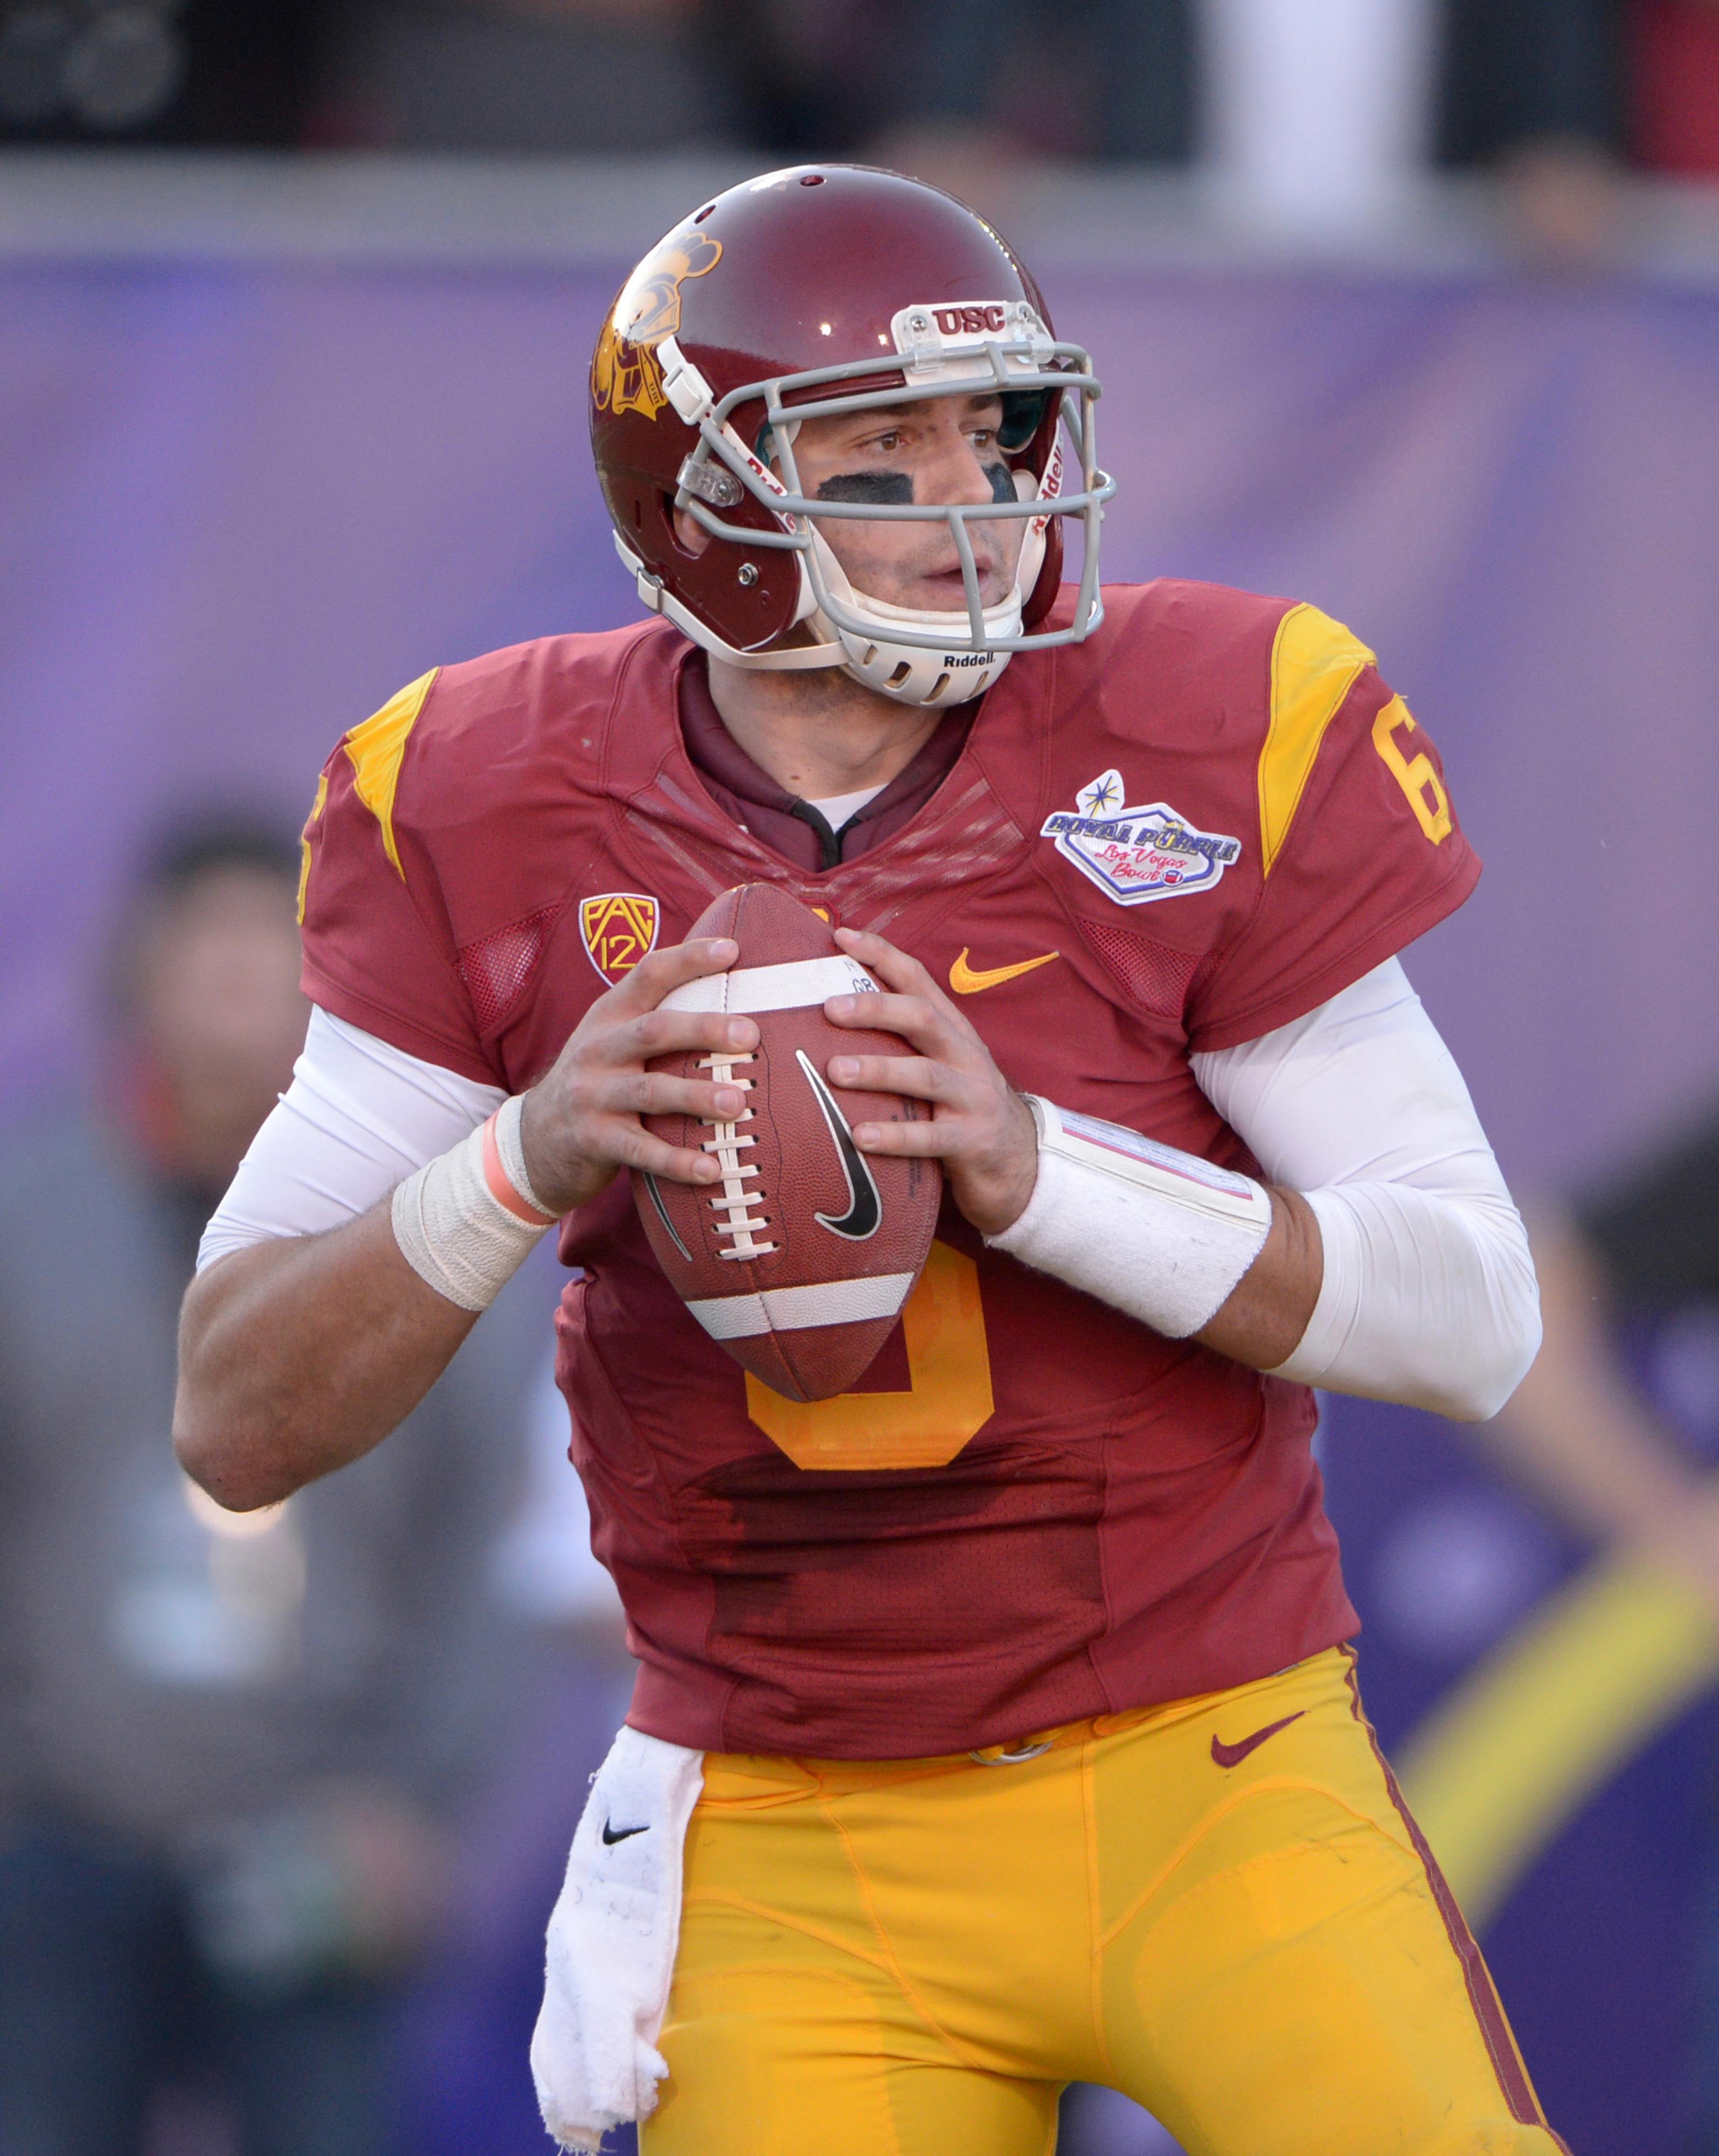 USC quarterback Cody Kessler will lead his Trojans into Rice-Eccles Stadium on Oct. 25.